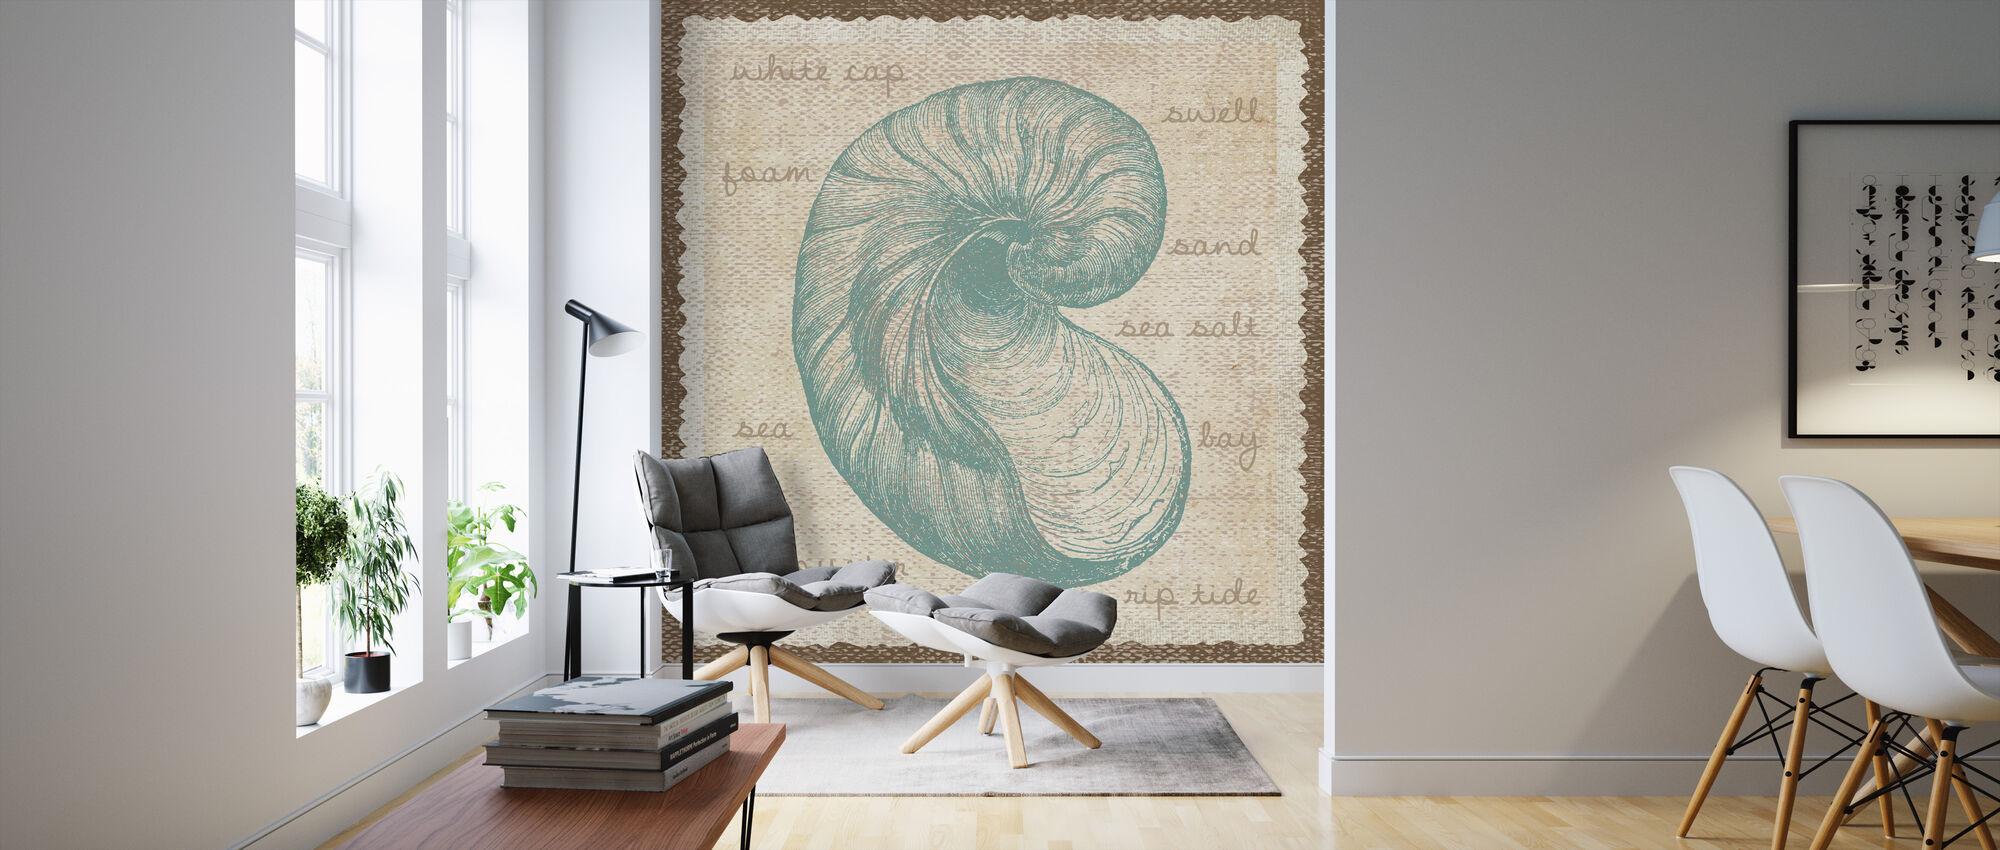 Oyster Art - Wallpaper - Living Room